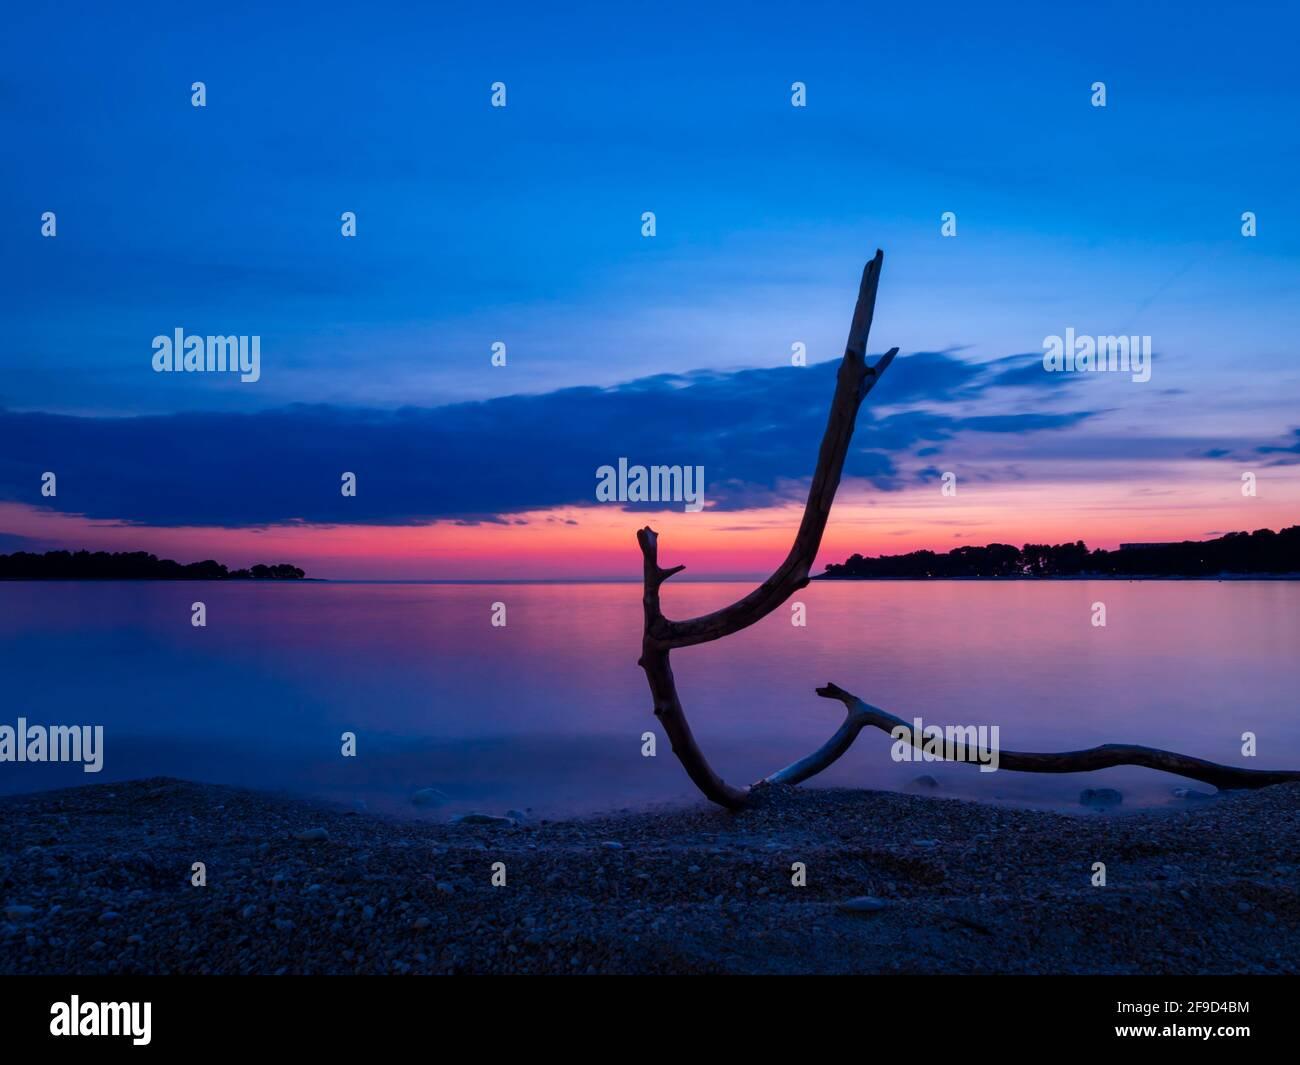 usk twilight  gorgeous stunning idyllic pretty beautiful seaside beach evening tranquility alluvion erected dried wooden wood tree trunk branch Stock Photo